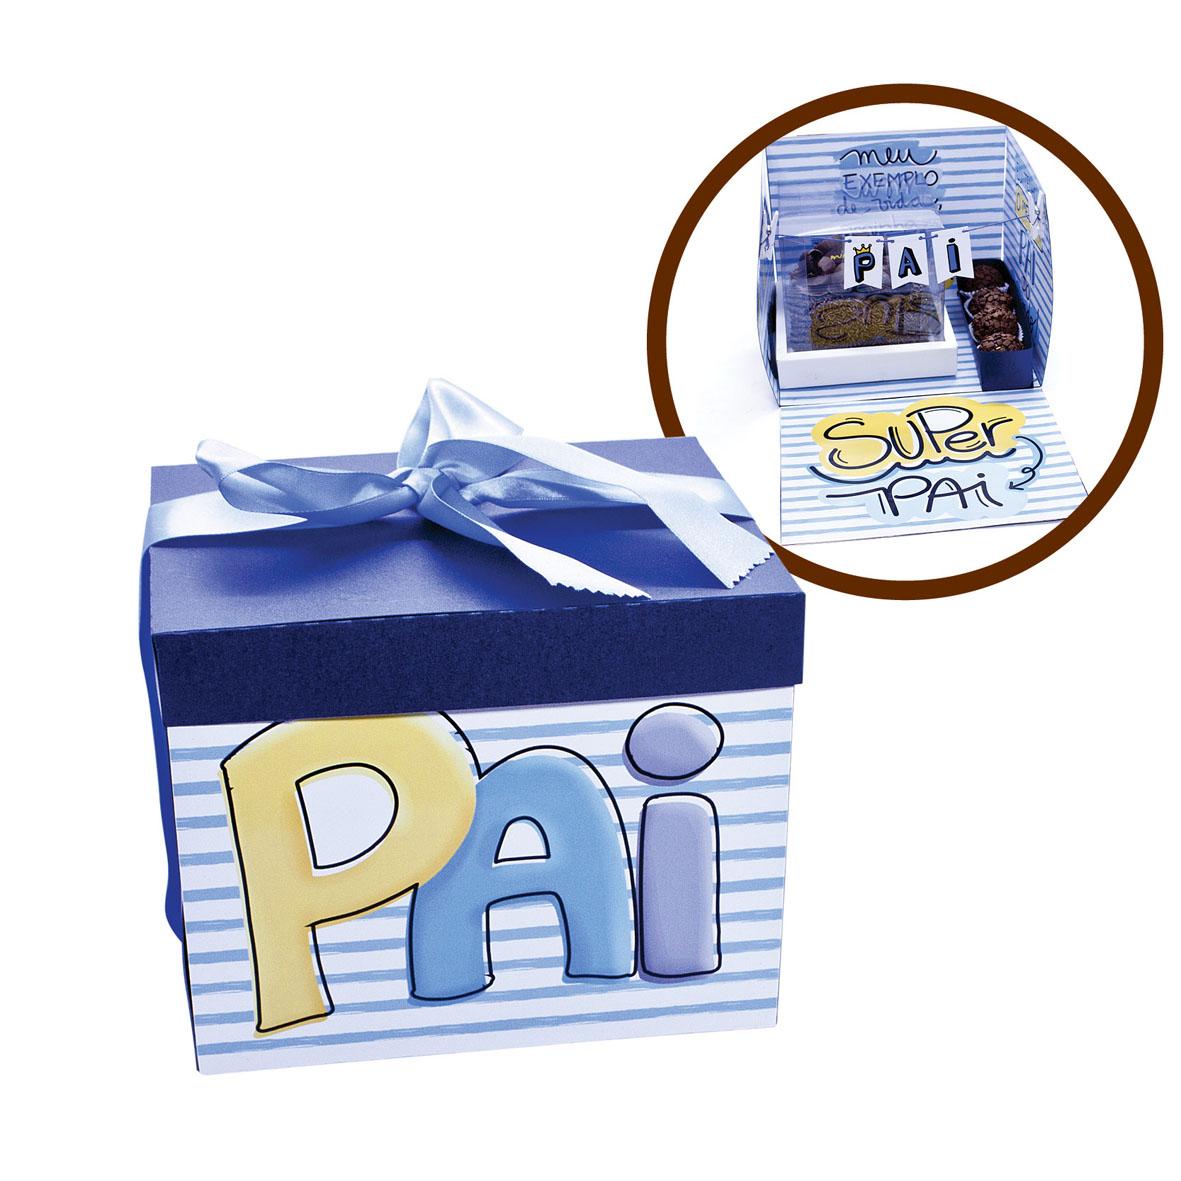 Caixa Surpresa Pai  - www.doceriamirabella.com.br